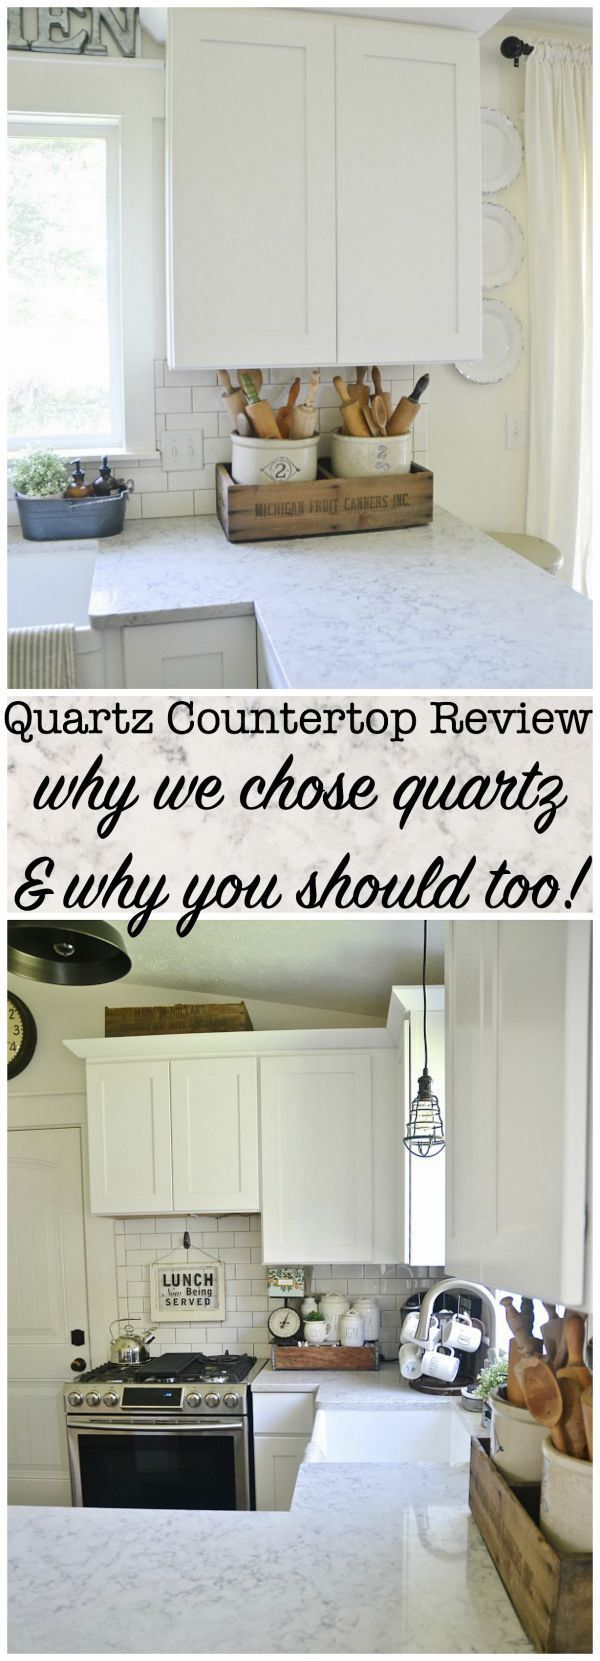 Quartz Countertop Review Pros Cons New Decorating Ideas